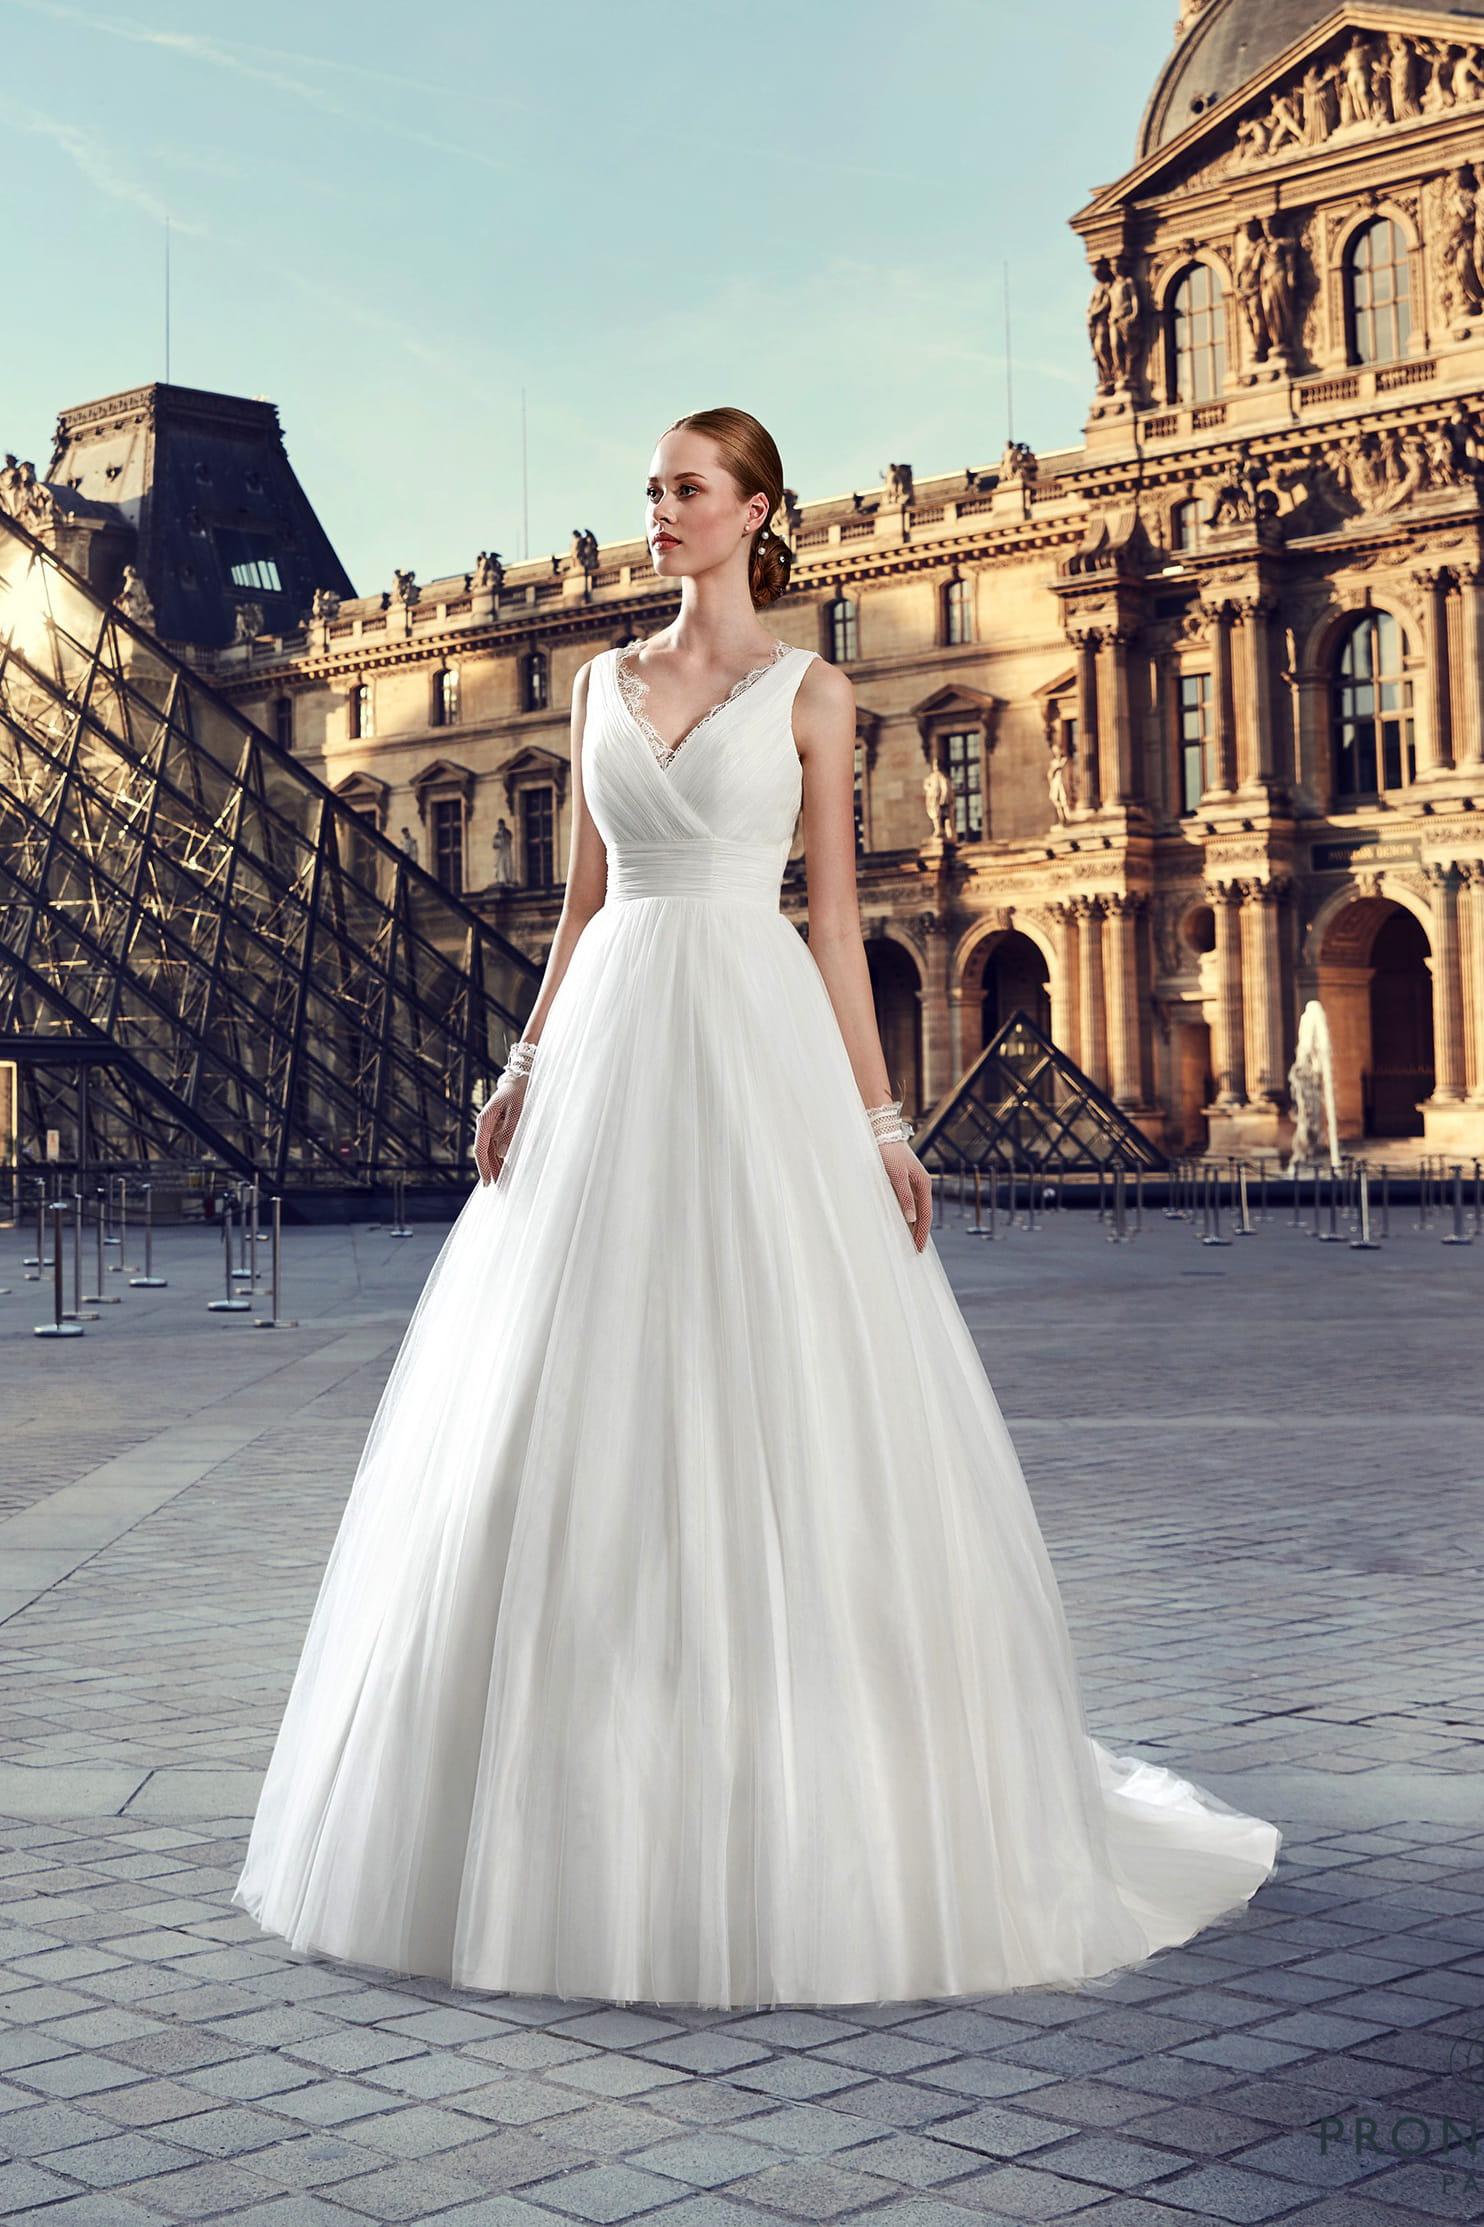 Robe de mariée Chaumont, Pronuptia